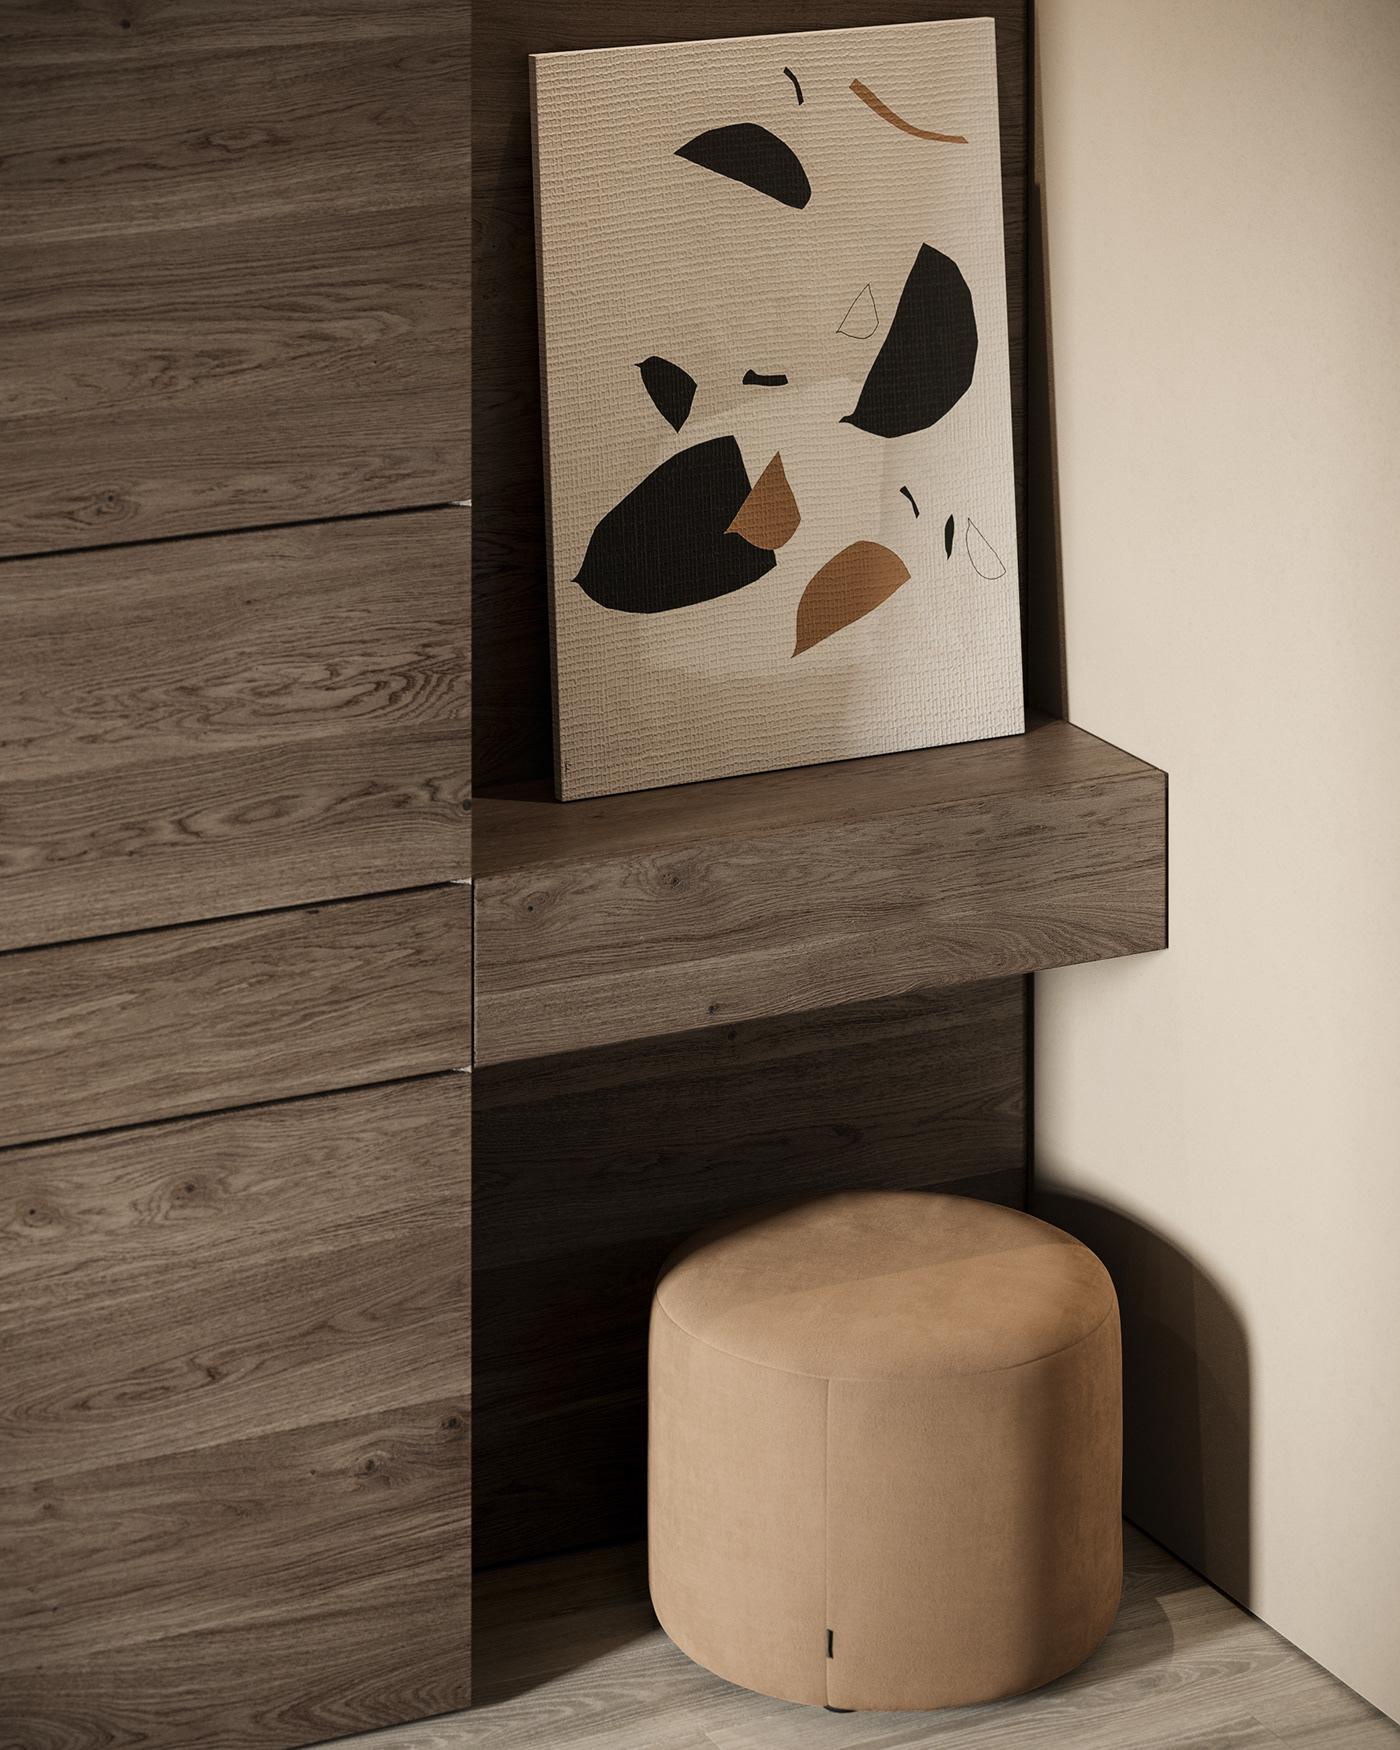 apartment fina fina design ira lysiuk irafox ivory light lysiuk ukraine